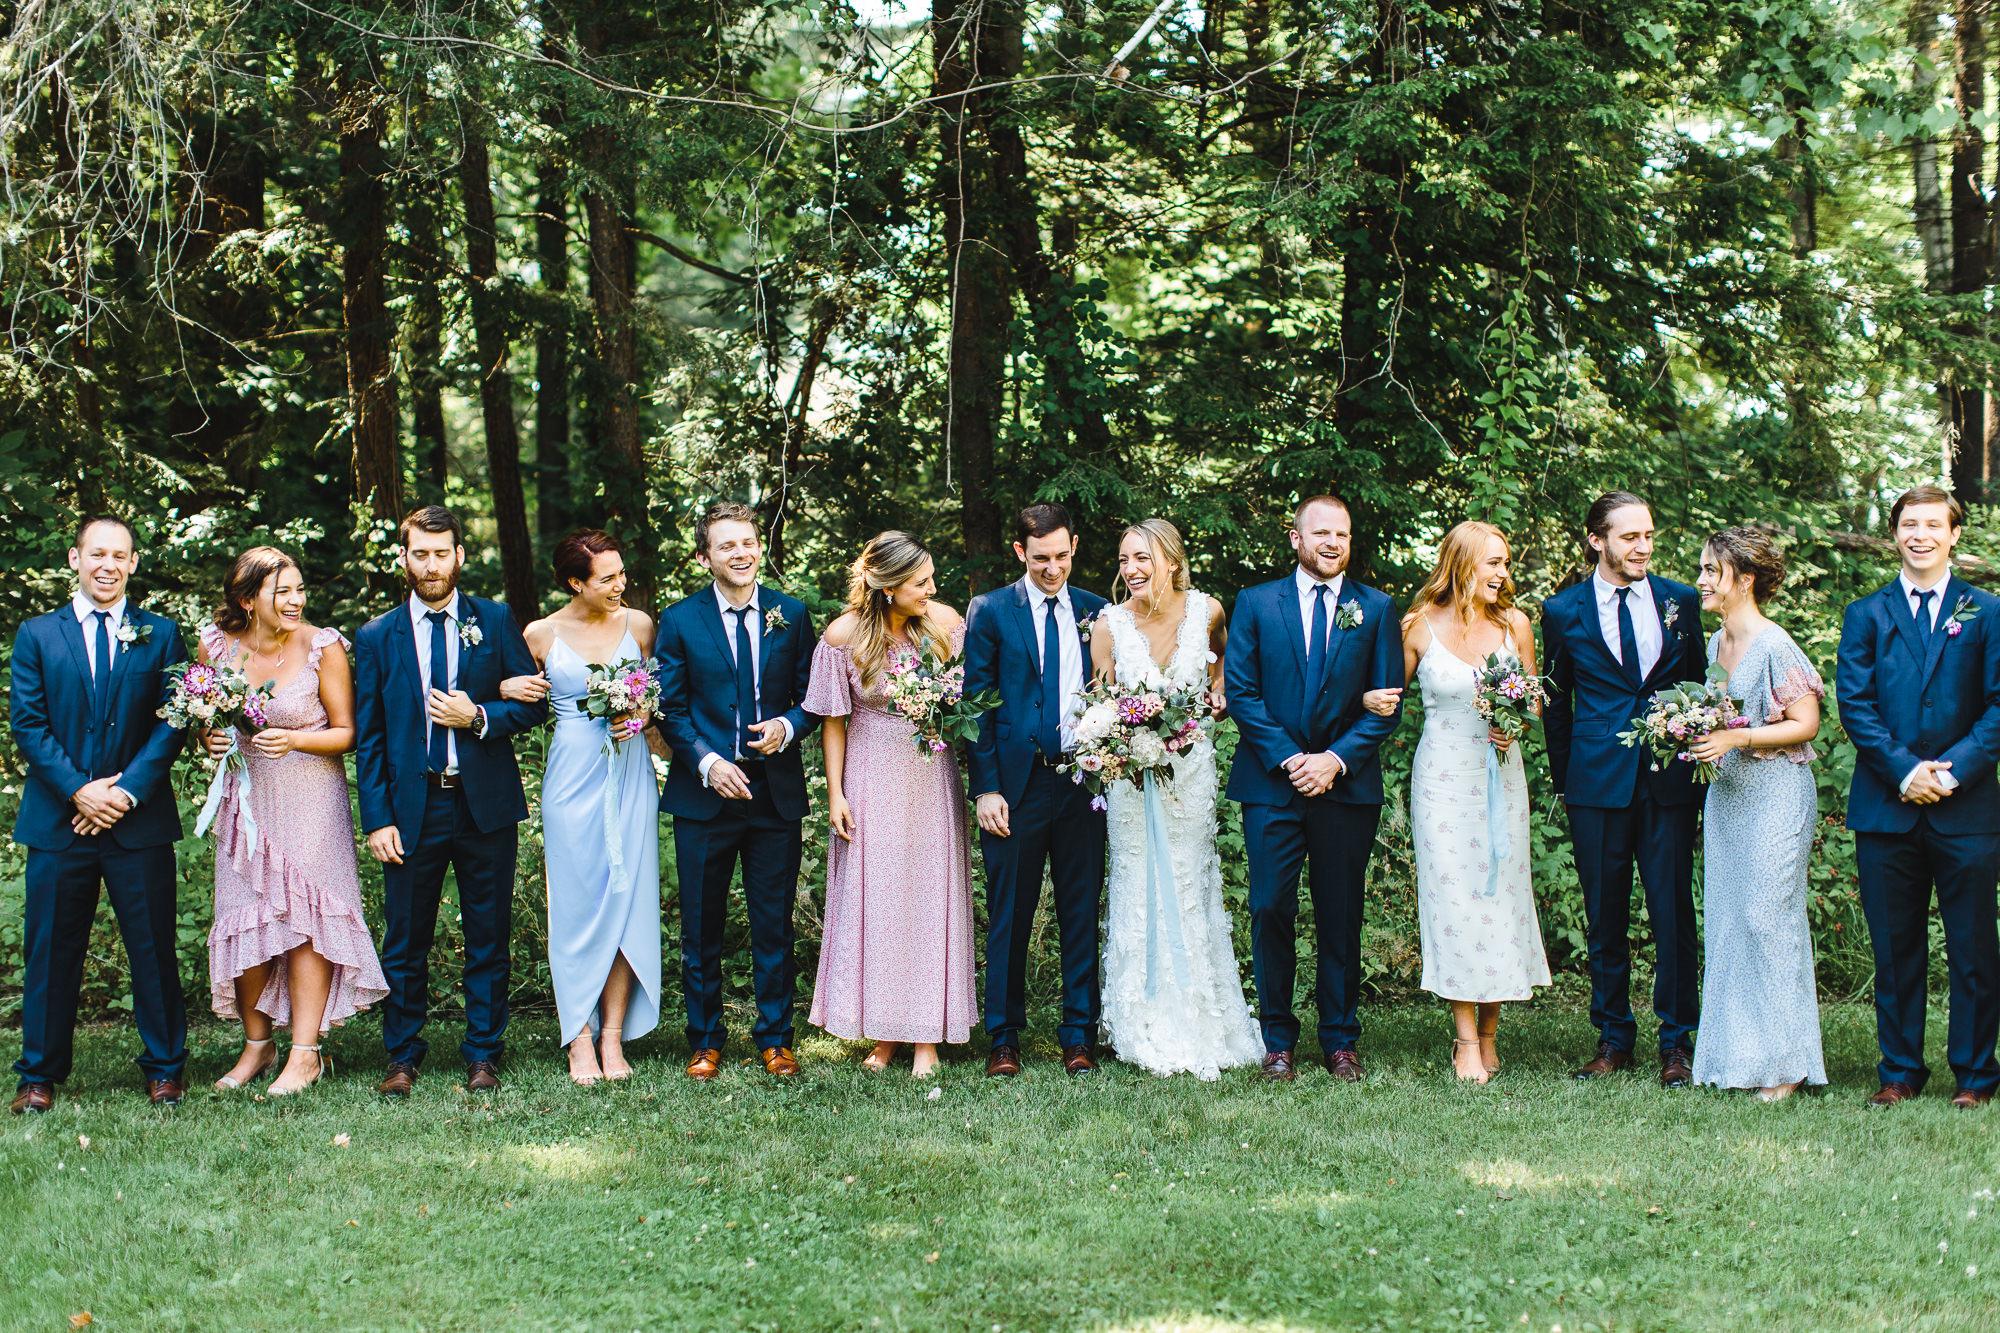 connecticut-summer-lake-wedding-emily-kirke-photography-upstyle (72 of 181).jpg